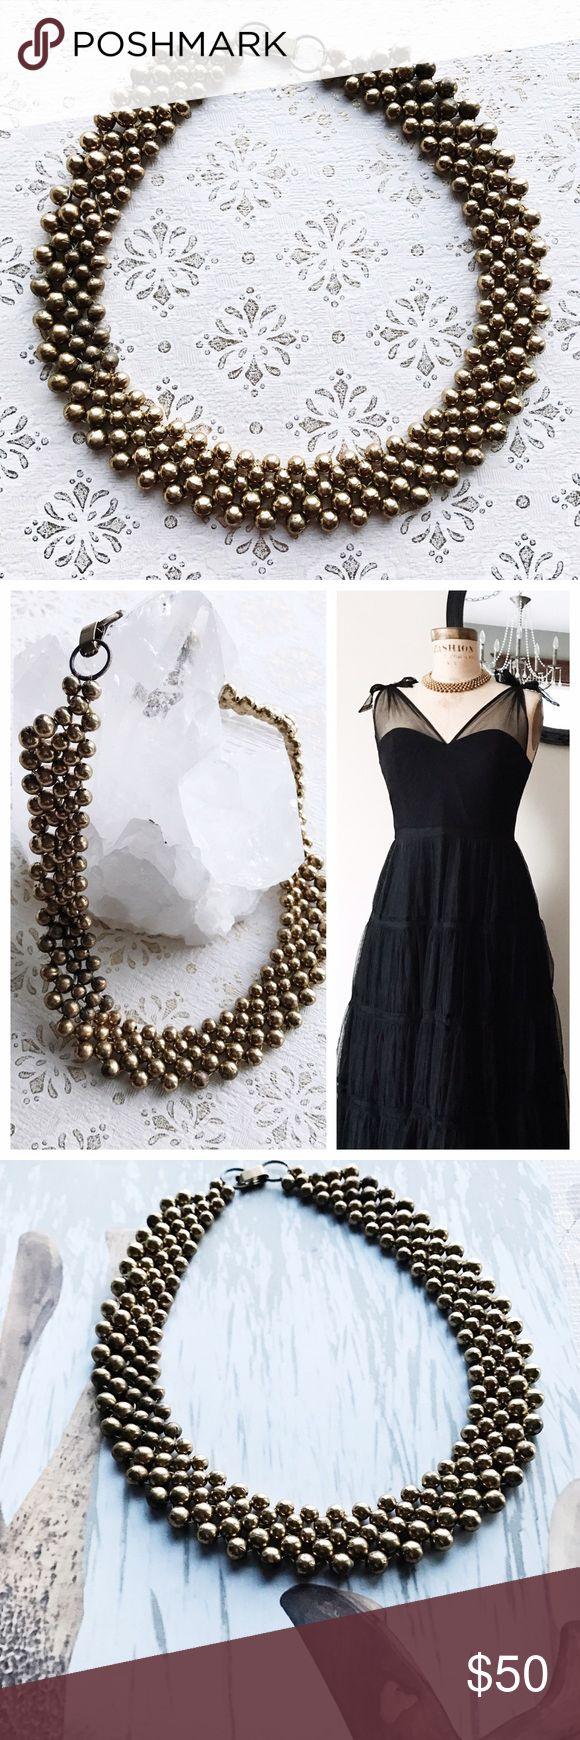 best adornos images on pinterest charm bracelets ornaments and